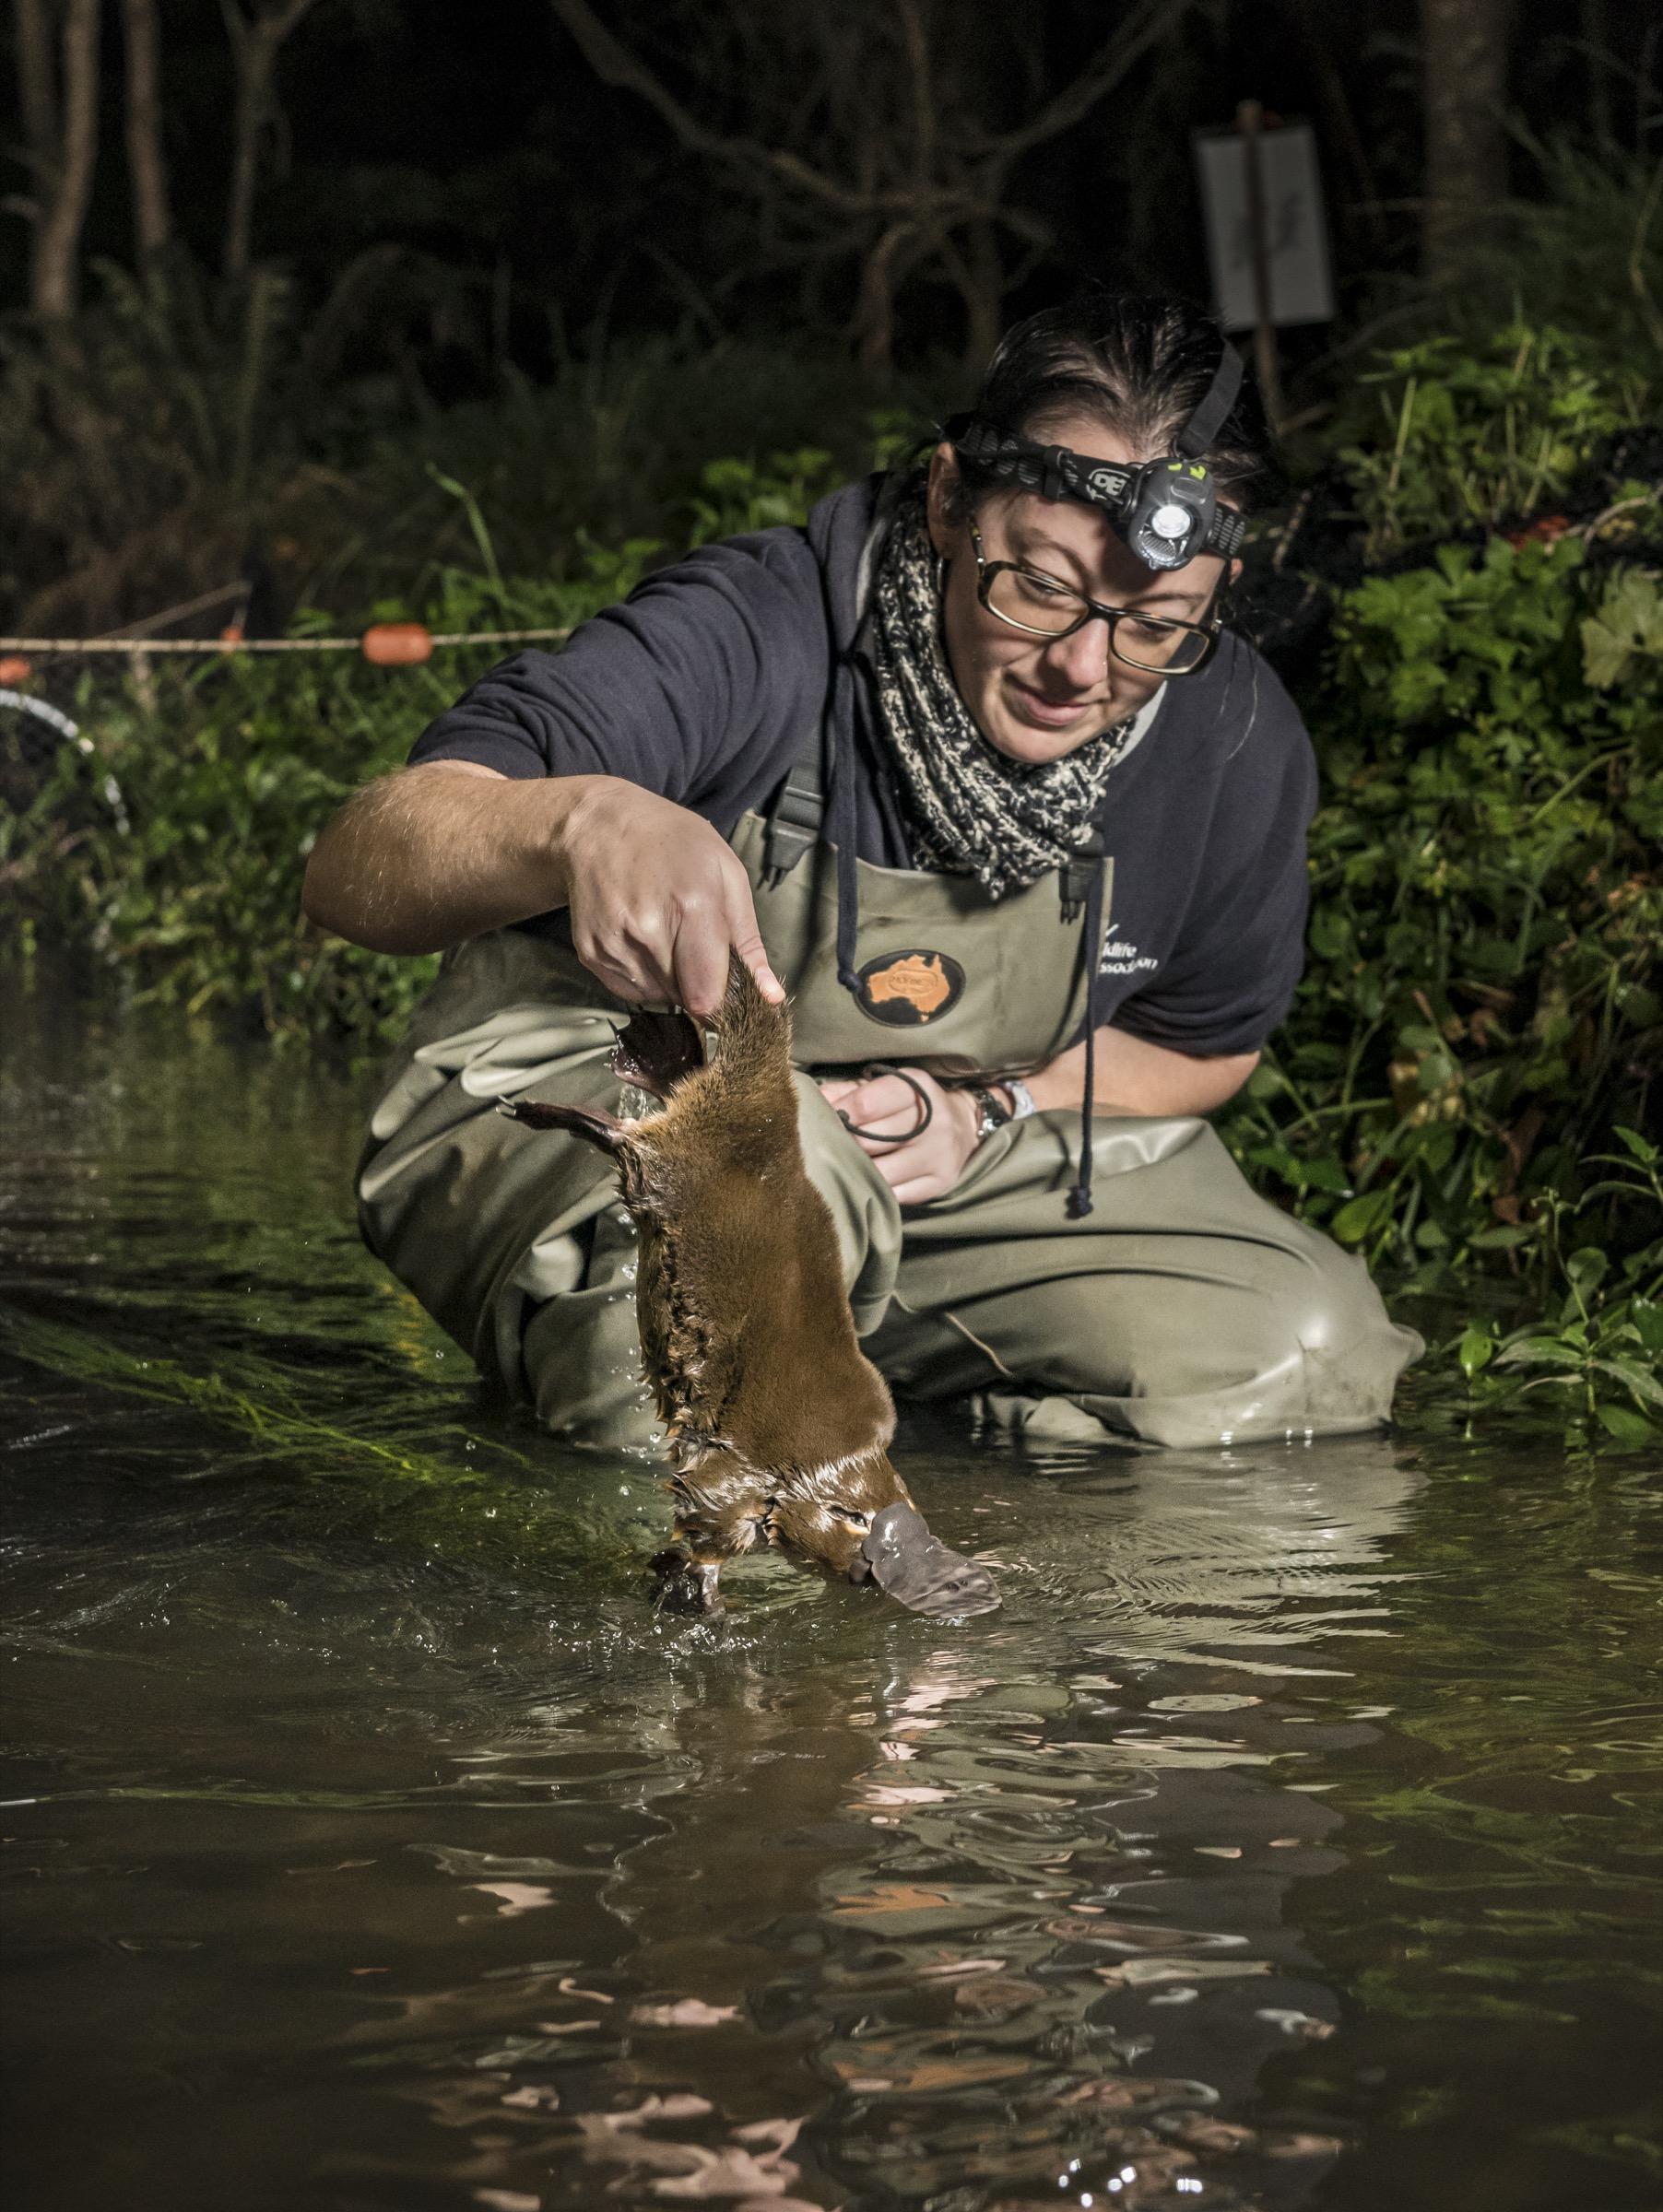 Un investigador libera un ornitorrinco capturado en Woori Yallock Creek, en Victoria, Australia.